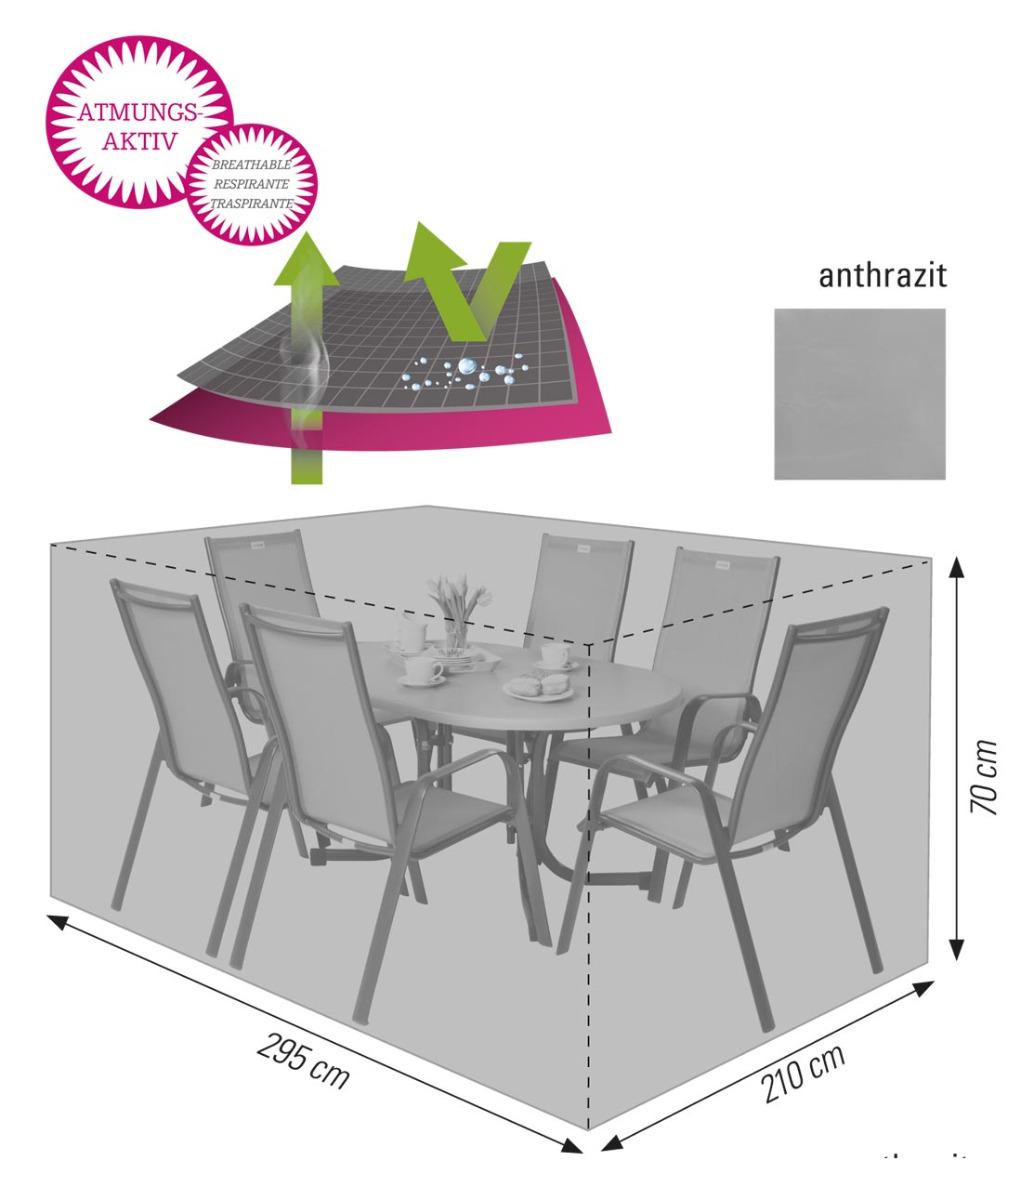 Atmungsaktive Schutzhülle für Sitzgruppen 295x210x70 cm anthrazit acamp cappa air Typ 59273